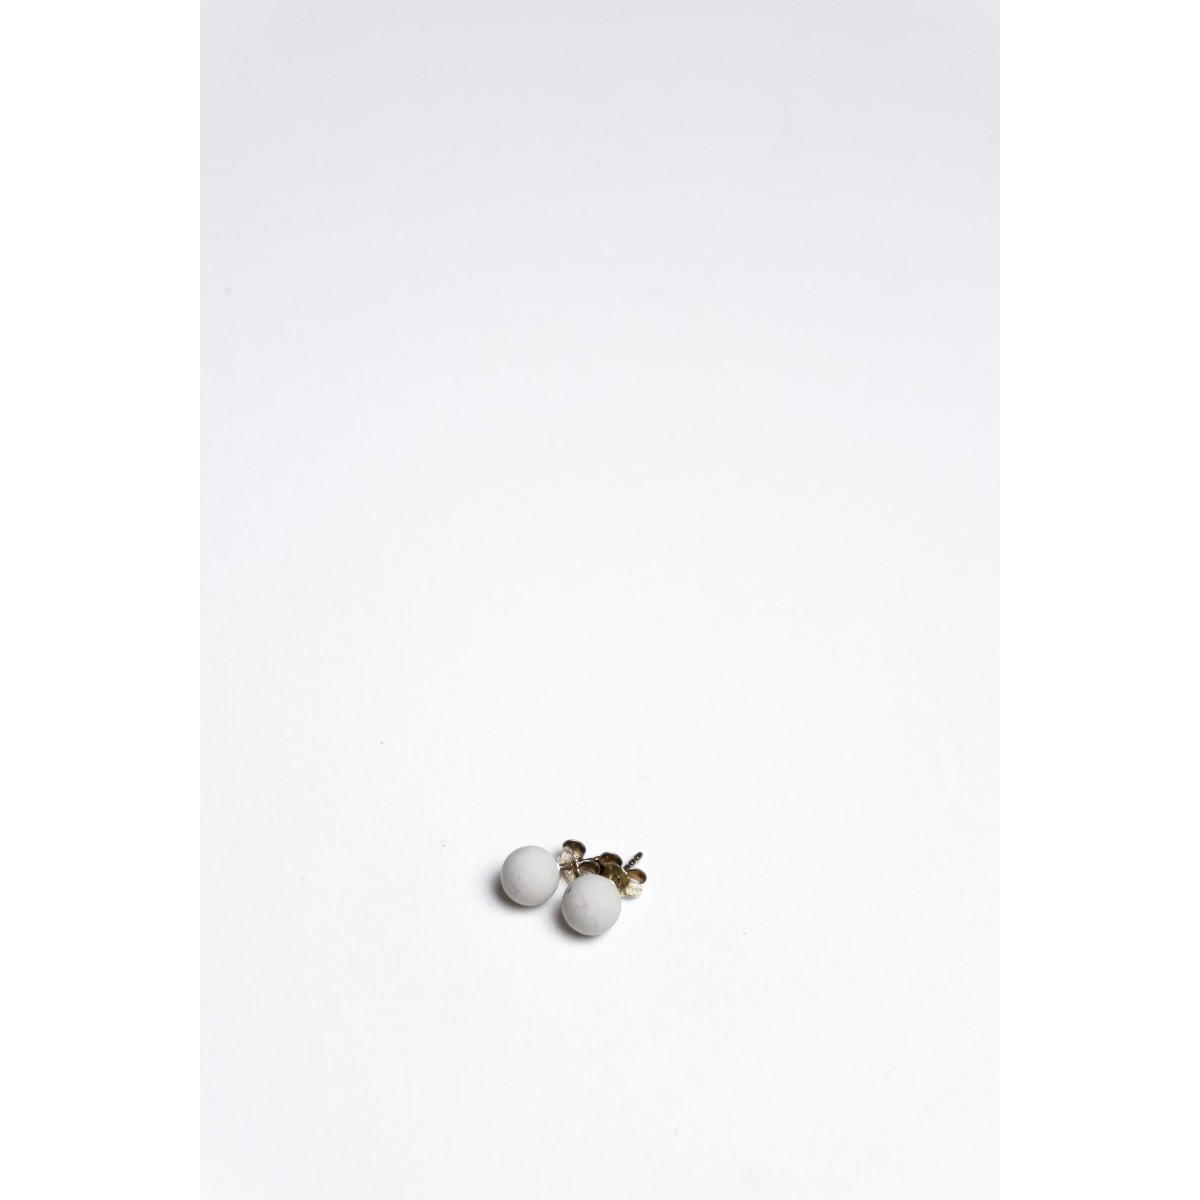 Klunkergrau Betonschmuck   Perlenohrringe aus Beton